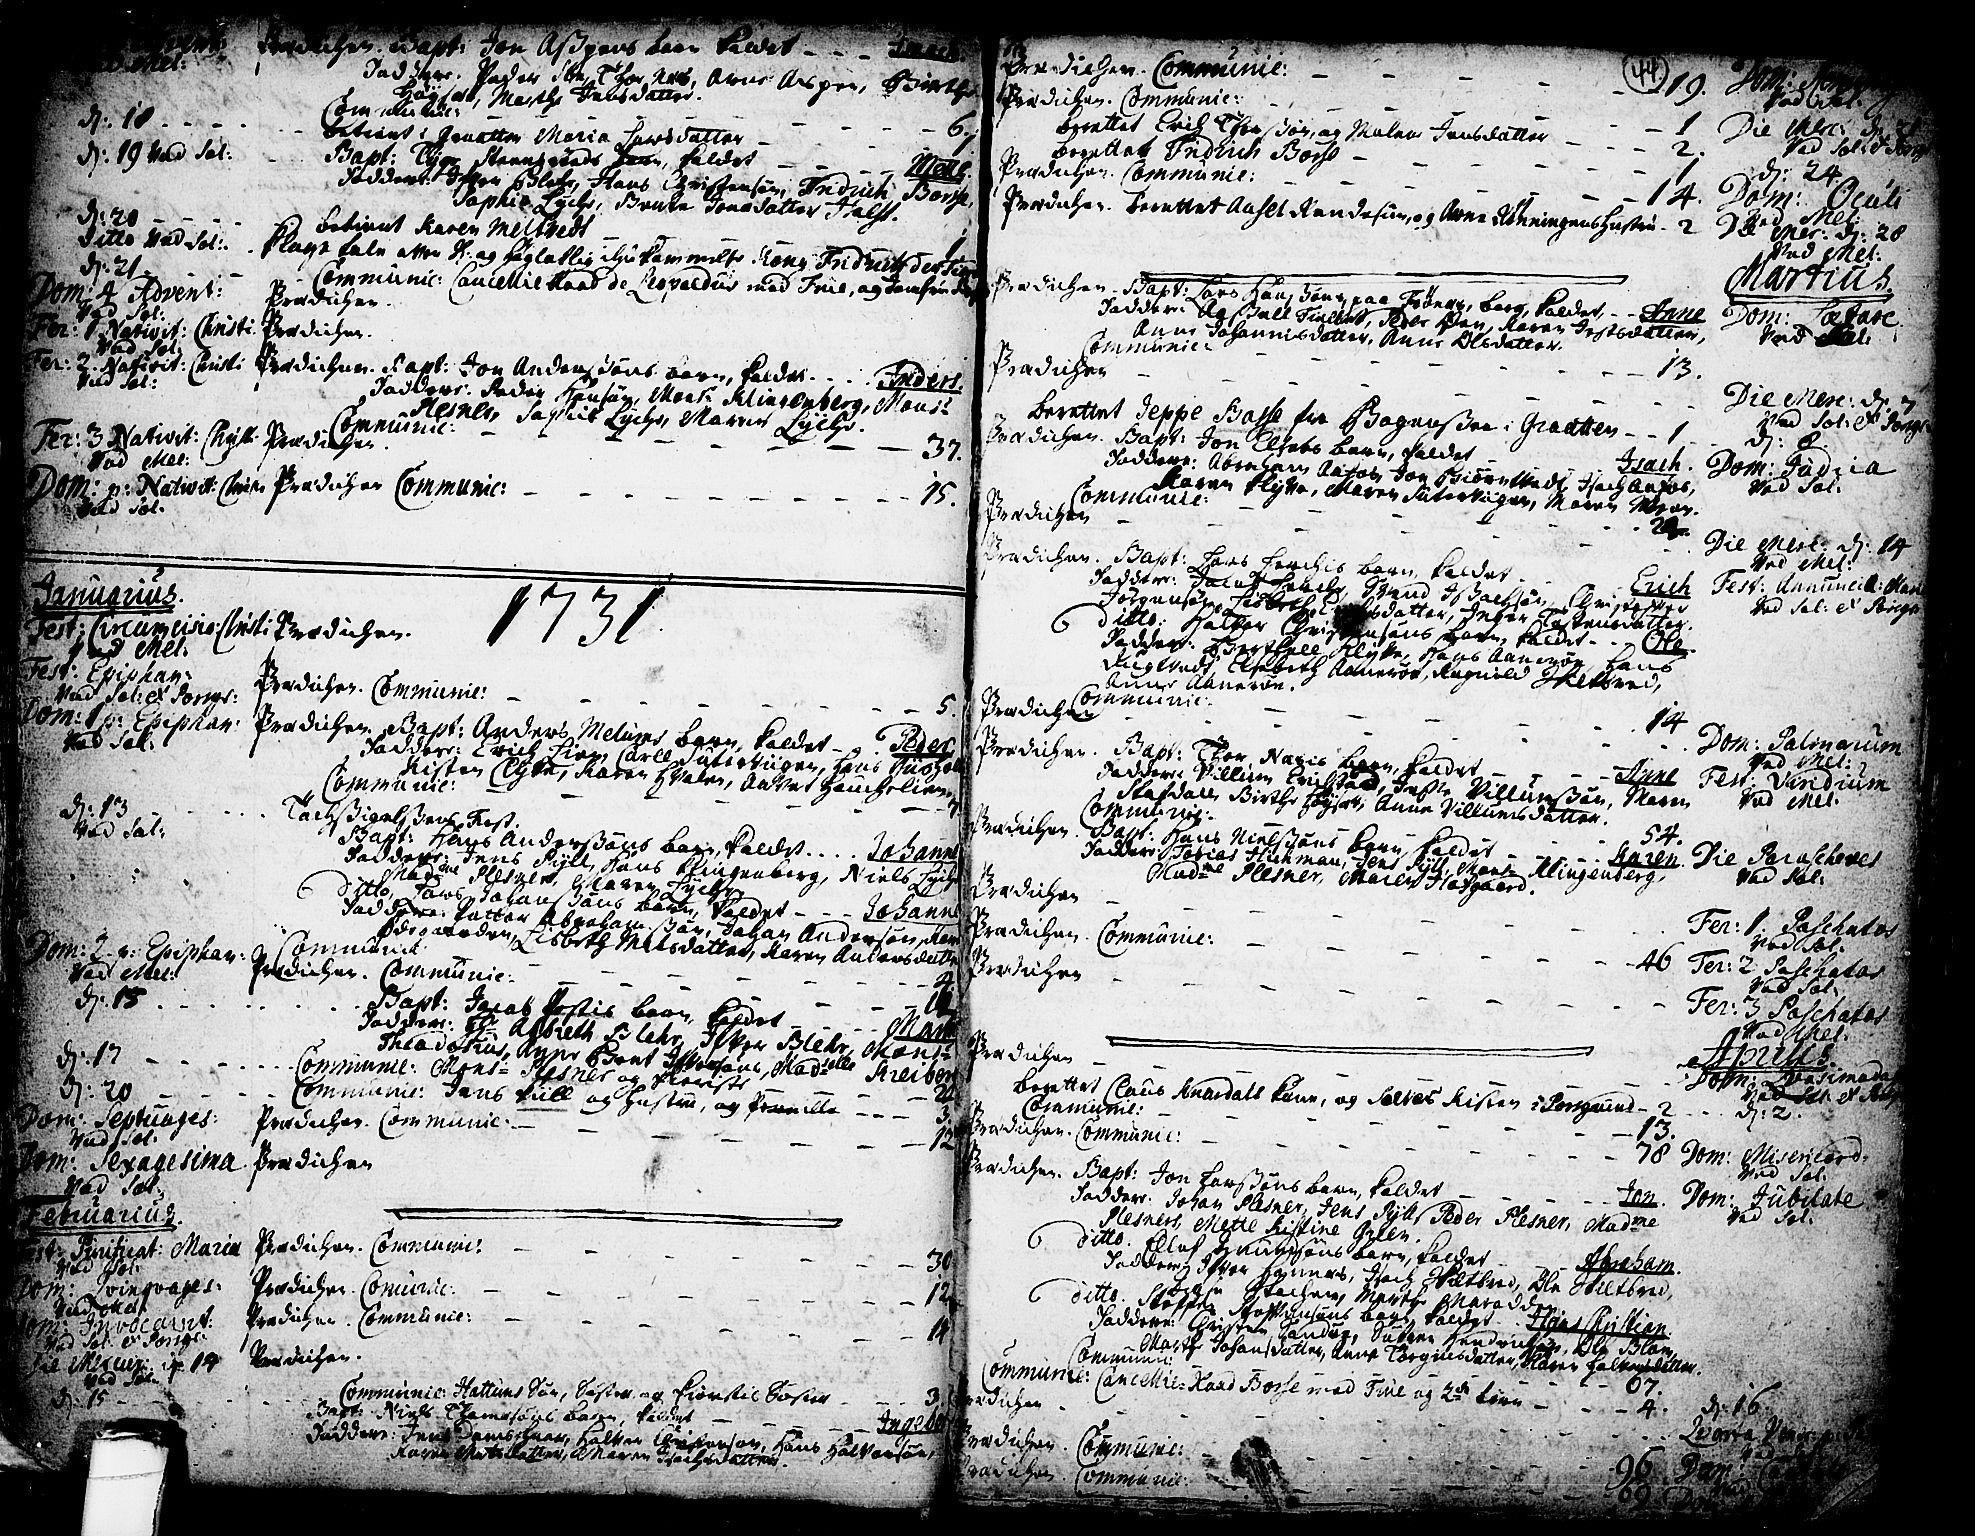 SAKO, Solum kirkebøker, F/Fa/L0002: Ministerialbok nr. I 2, 1713-1761, s. 44